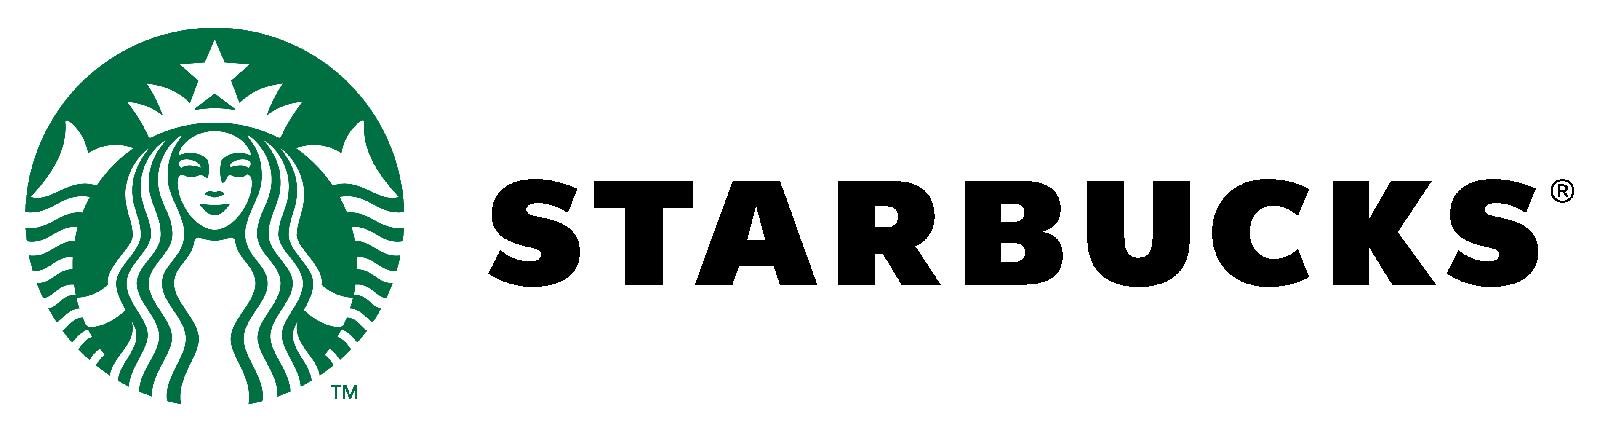 Font-Starbucks-Logo.png